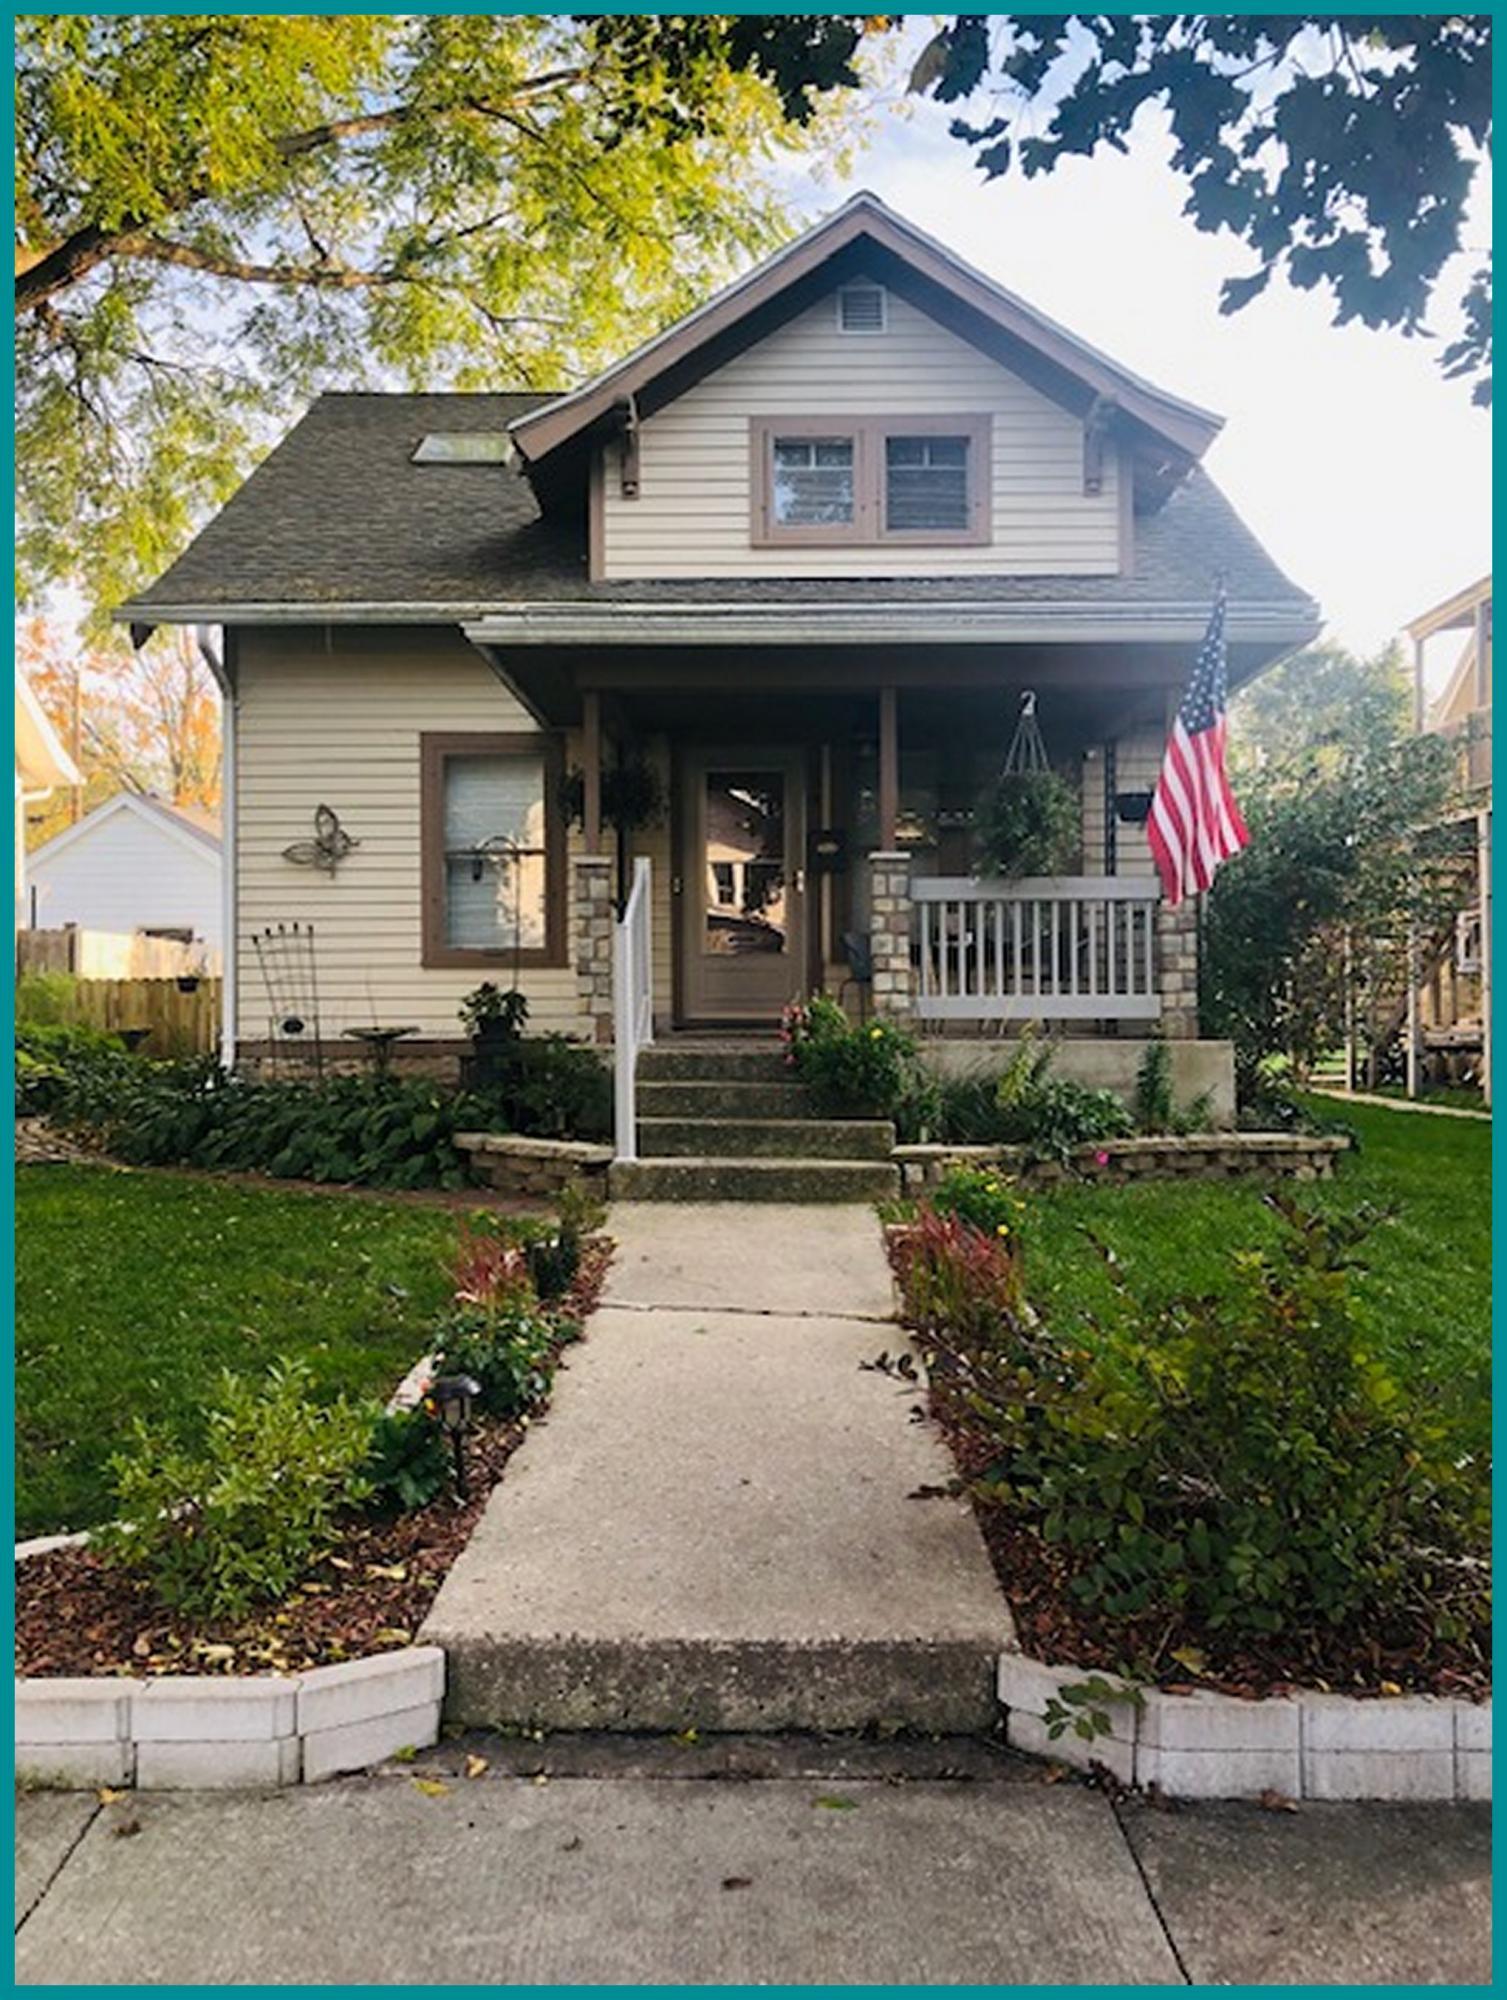 229 Wilson Ave, Waukesha, Wisconsin 53186, 4 Bedrooms Bedrooms, 7 Rooms Rooms,2 BathroomsBathrooms,Single-Family,For Sale,Wilson Ave,1610381